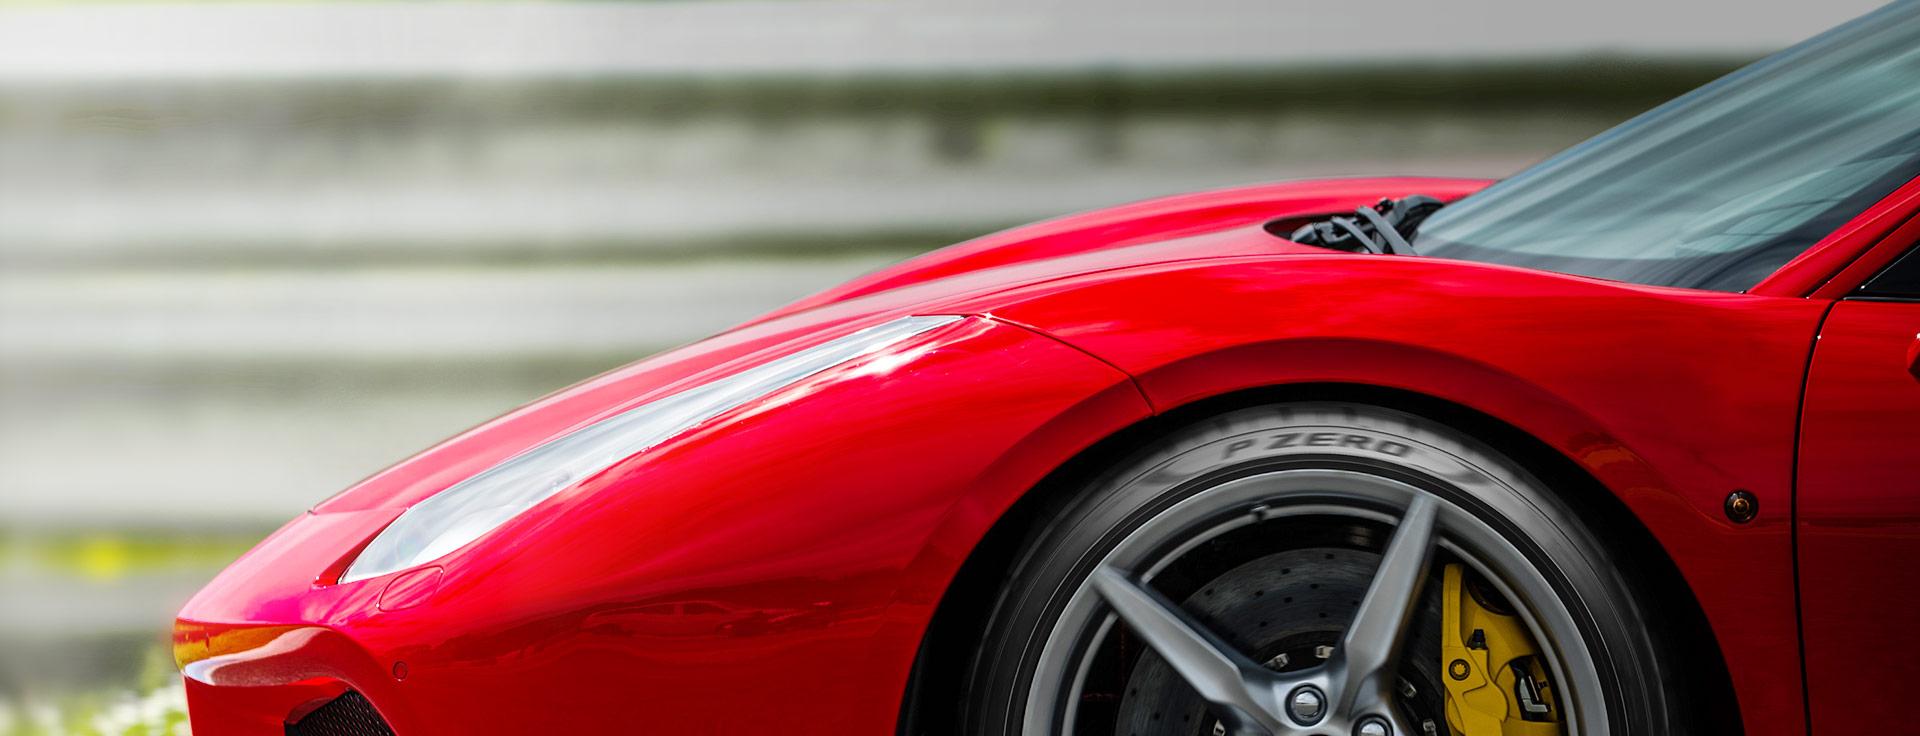 Ferrari - Pirelli for Ferrari: a story of Italian excellence